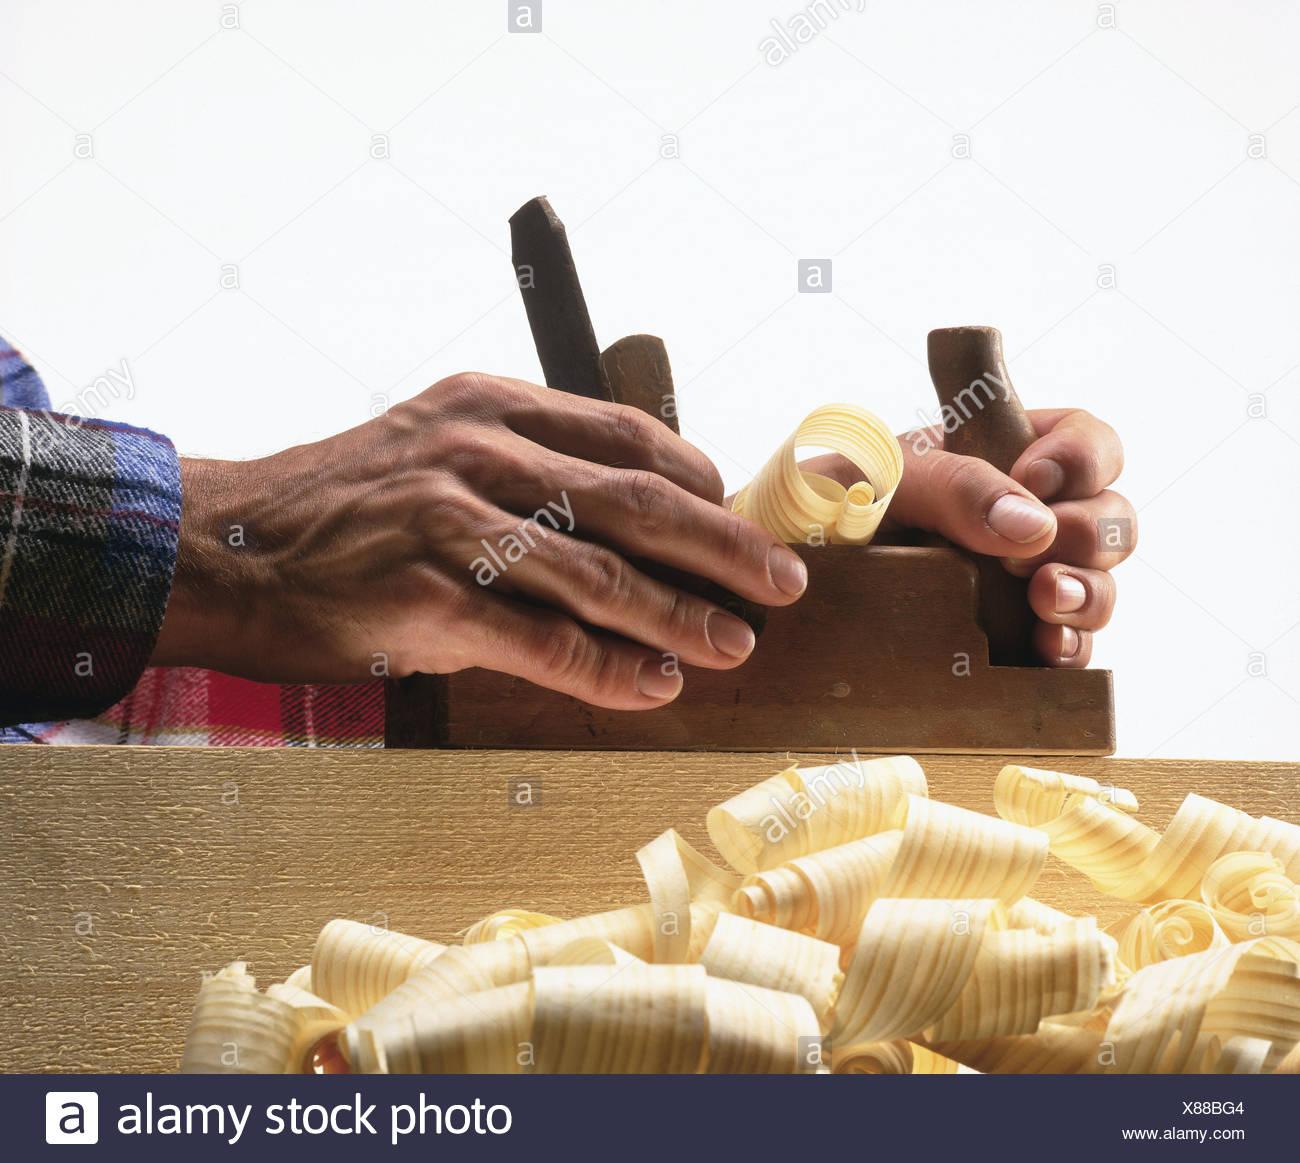 Carpenters, work, chop detail, hands, planes man, wood processing, shavings, wood shavings, occupation, work, work, craft, craftsman - Stock Image